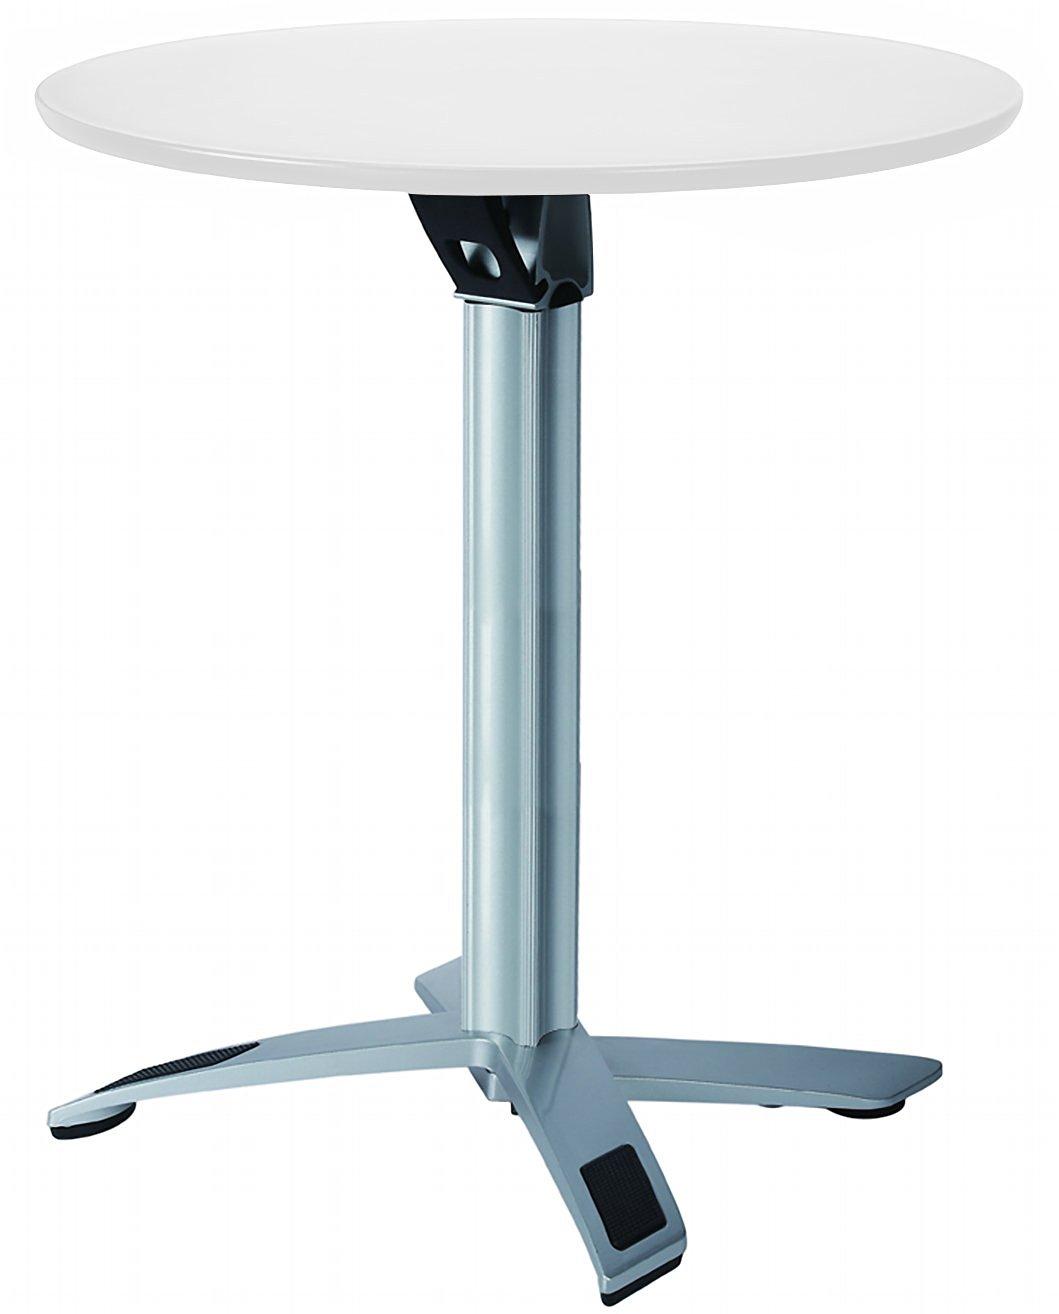 option-1-occasion-bistro-table-white.jpg